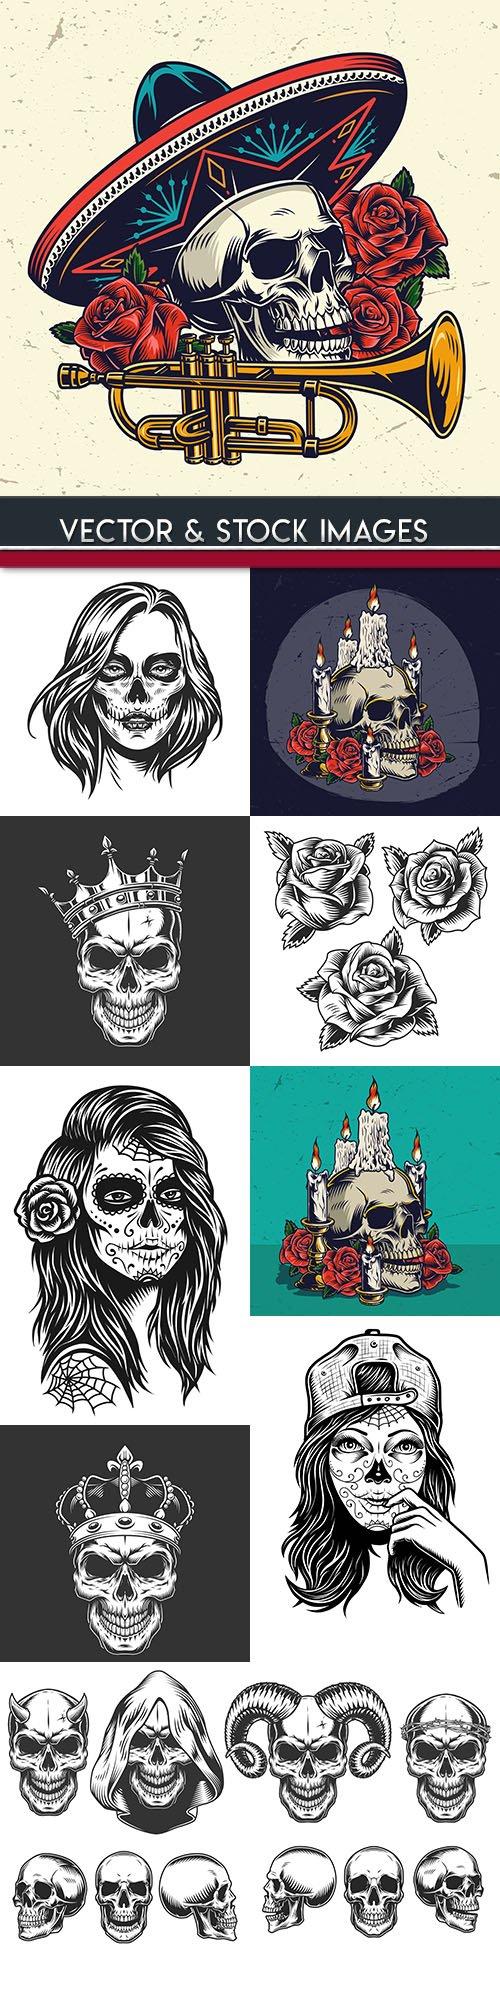 Skull and dead head tattoo grunge illustration